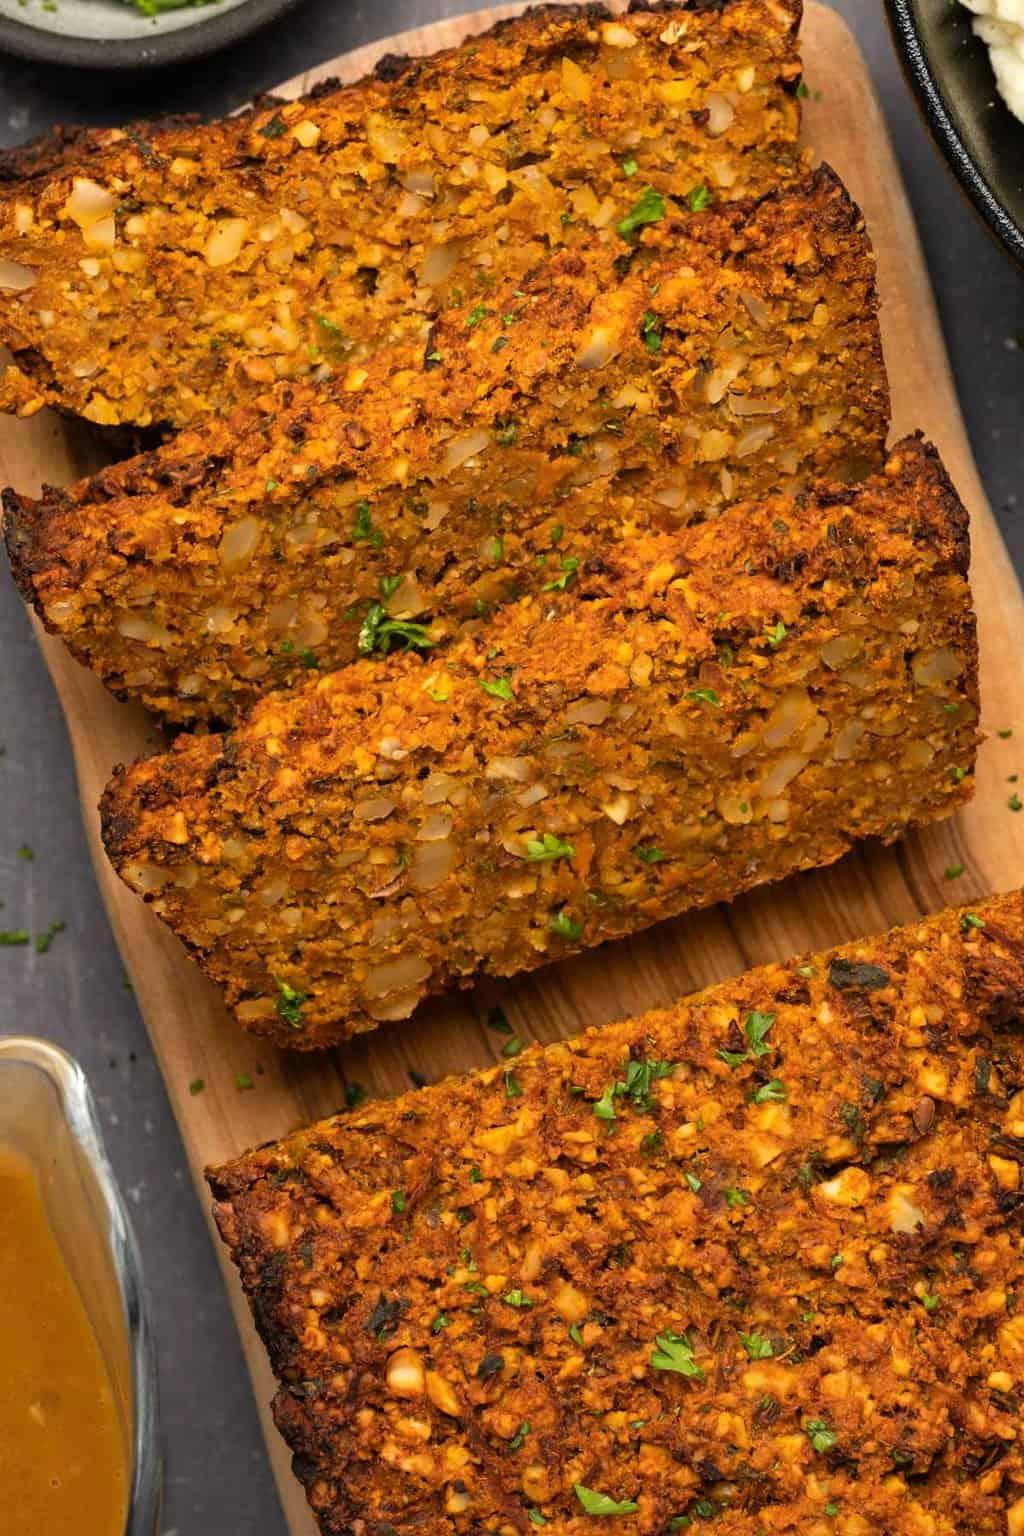 Slices of vegan nut roast on a wooden board.